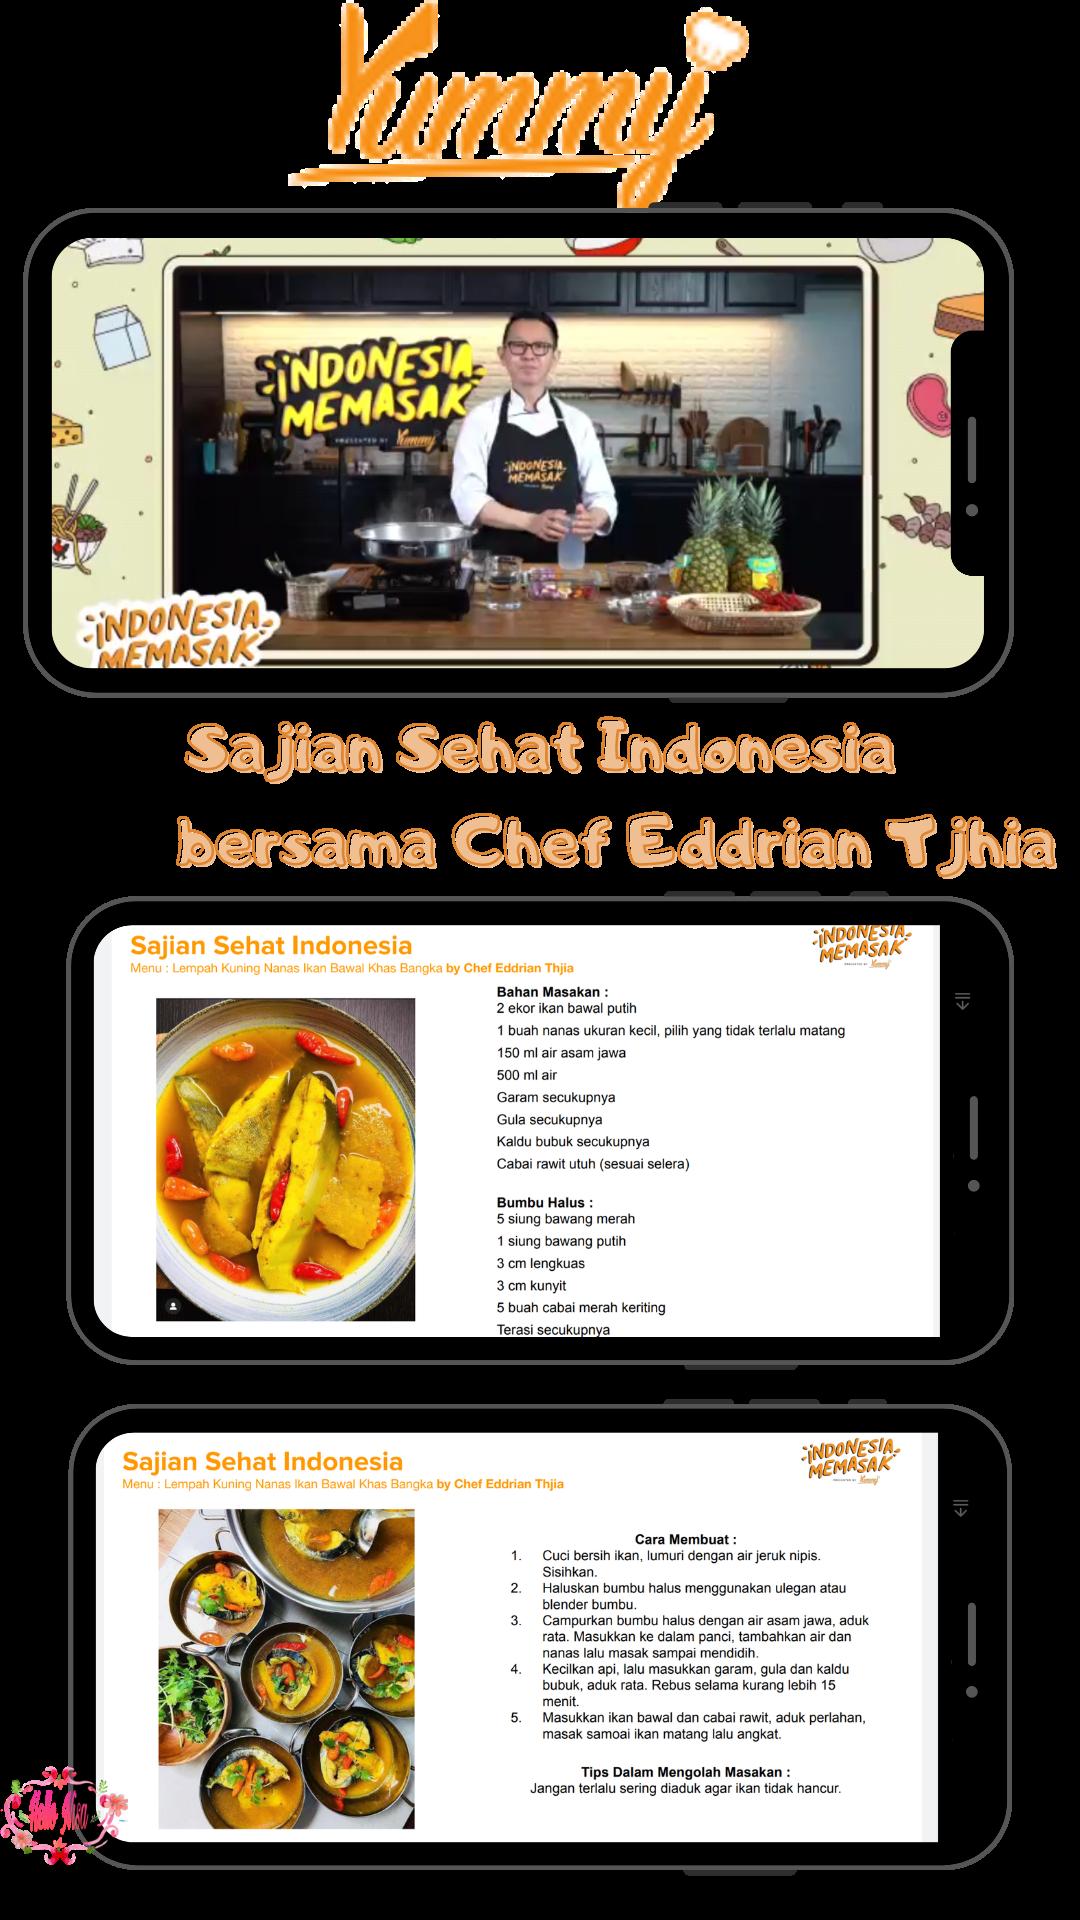 cooking class chef Eddrian Thjia